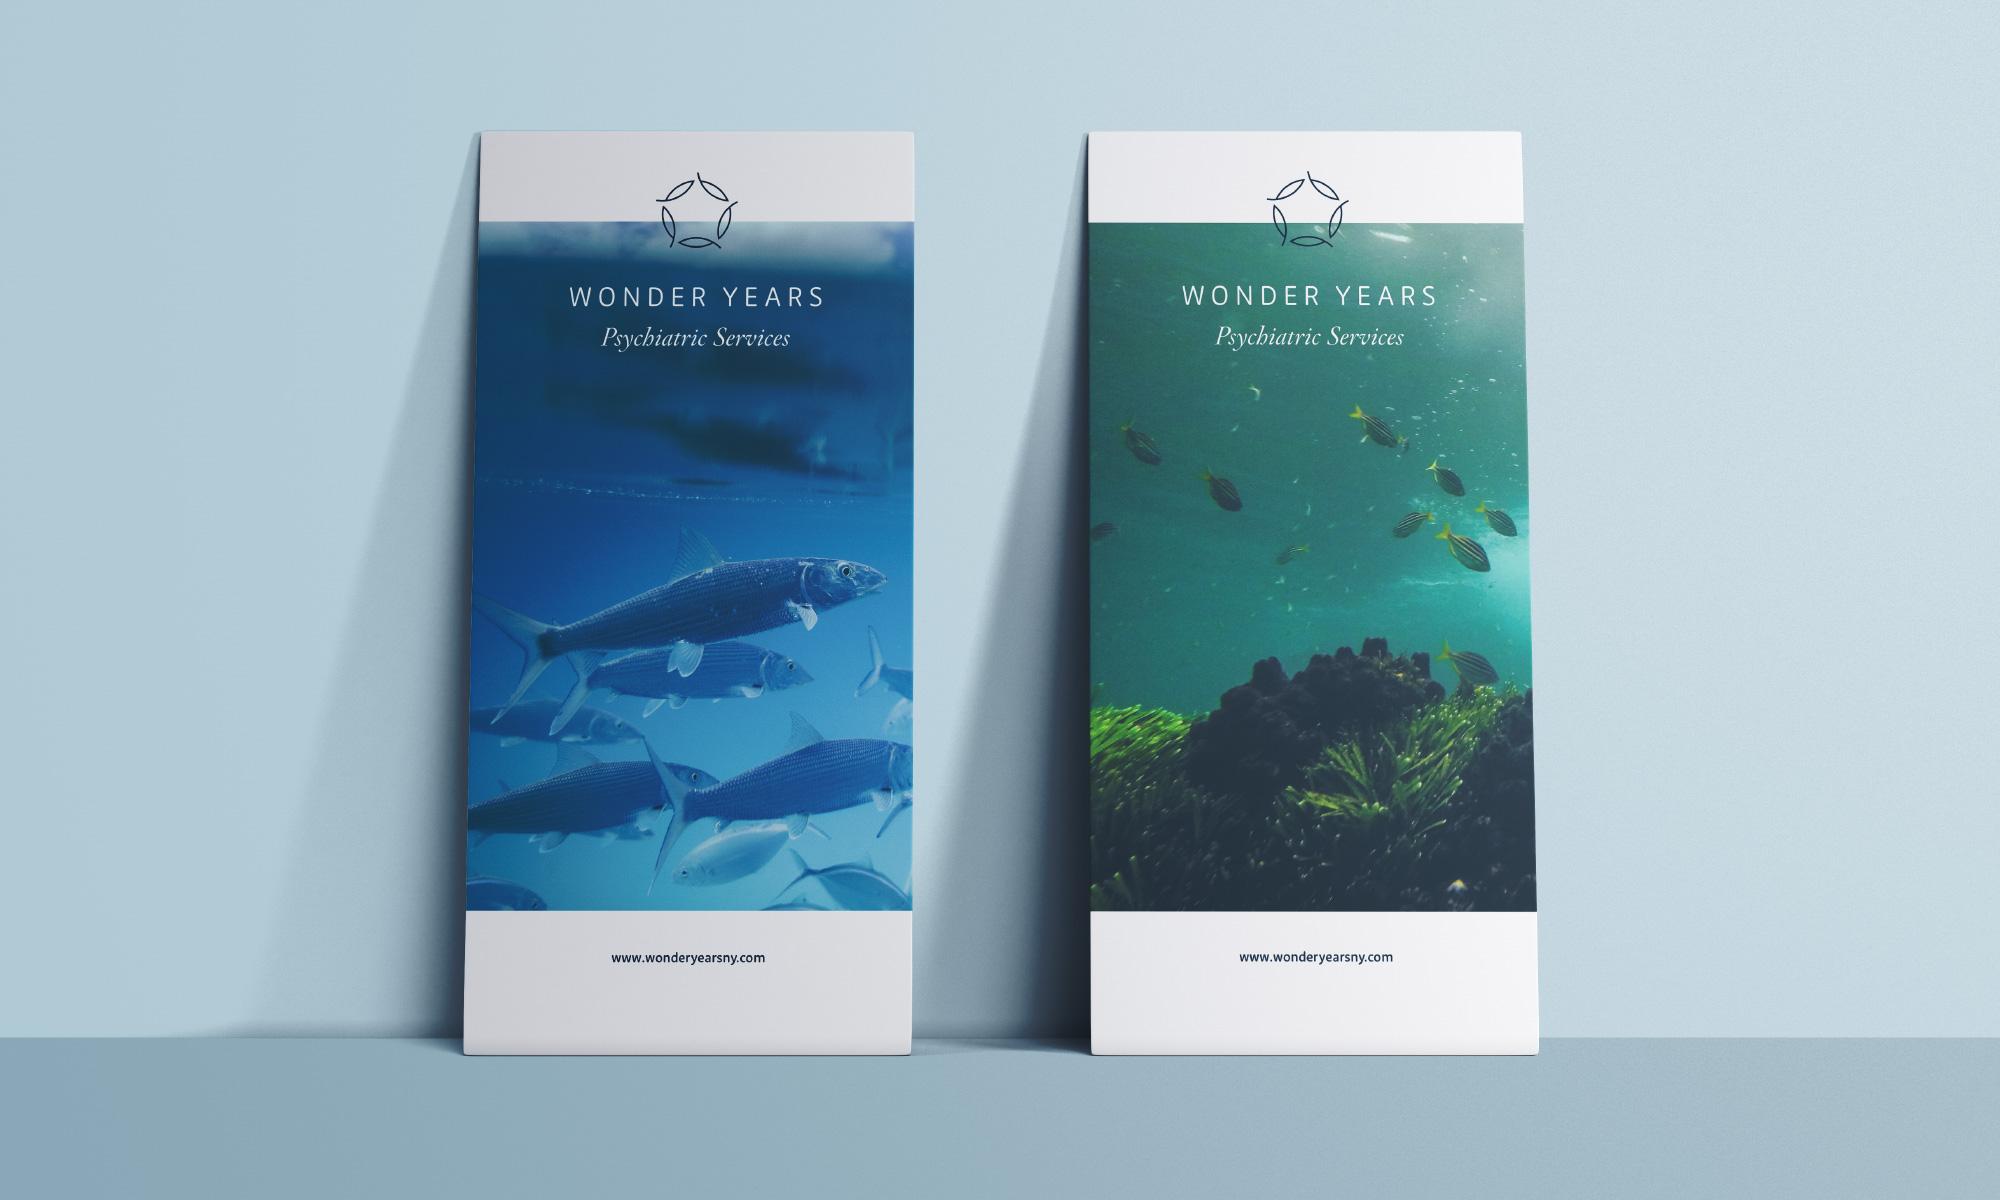 Wonder Years leaflets